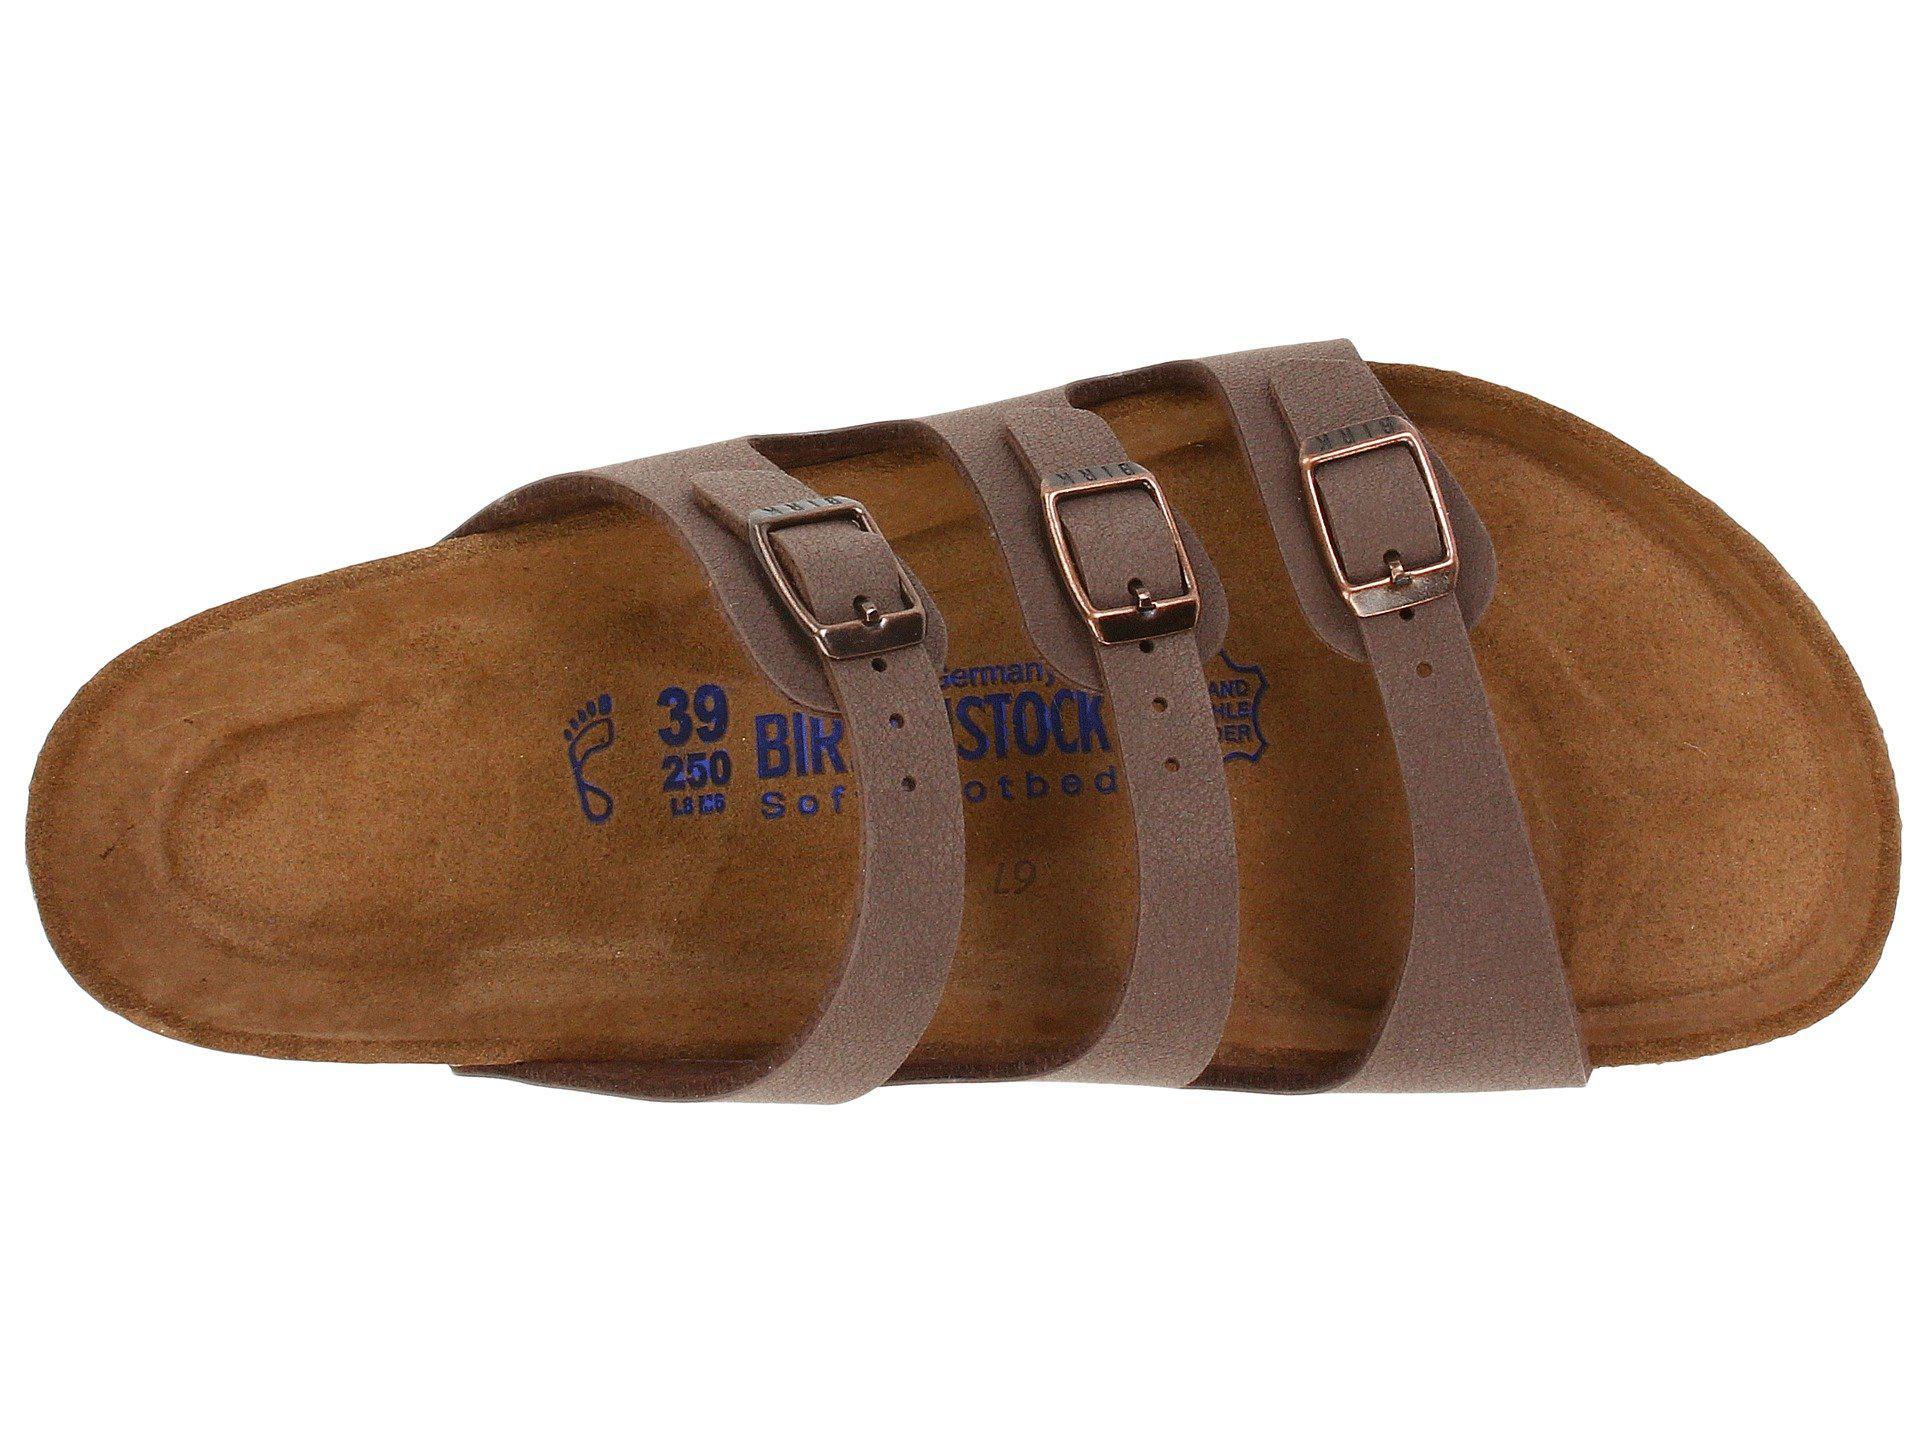 e8d03465f8 Birkenstock - Brown Florida Soft Footbed - Birkibuc (mocha Birkibuc)  Women s Sandals - Lyst. View fullscreen